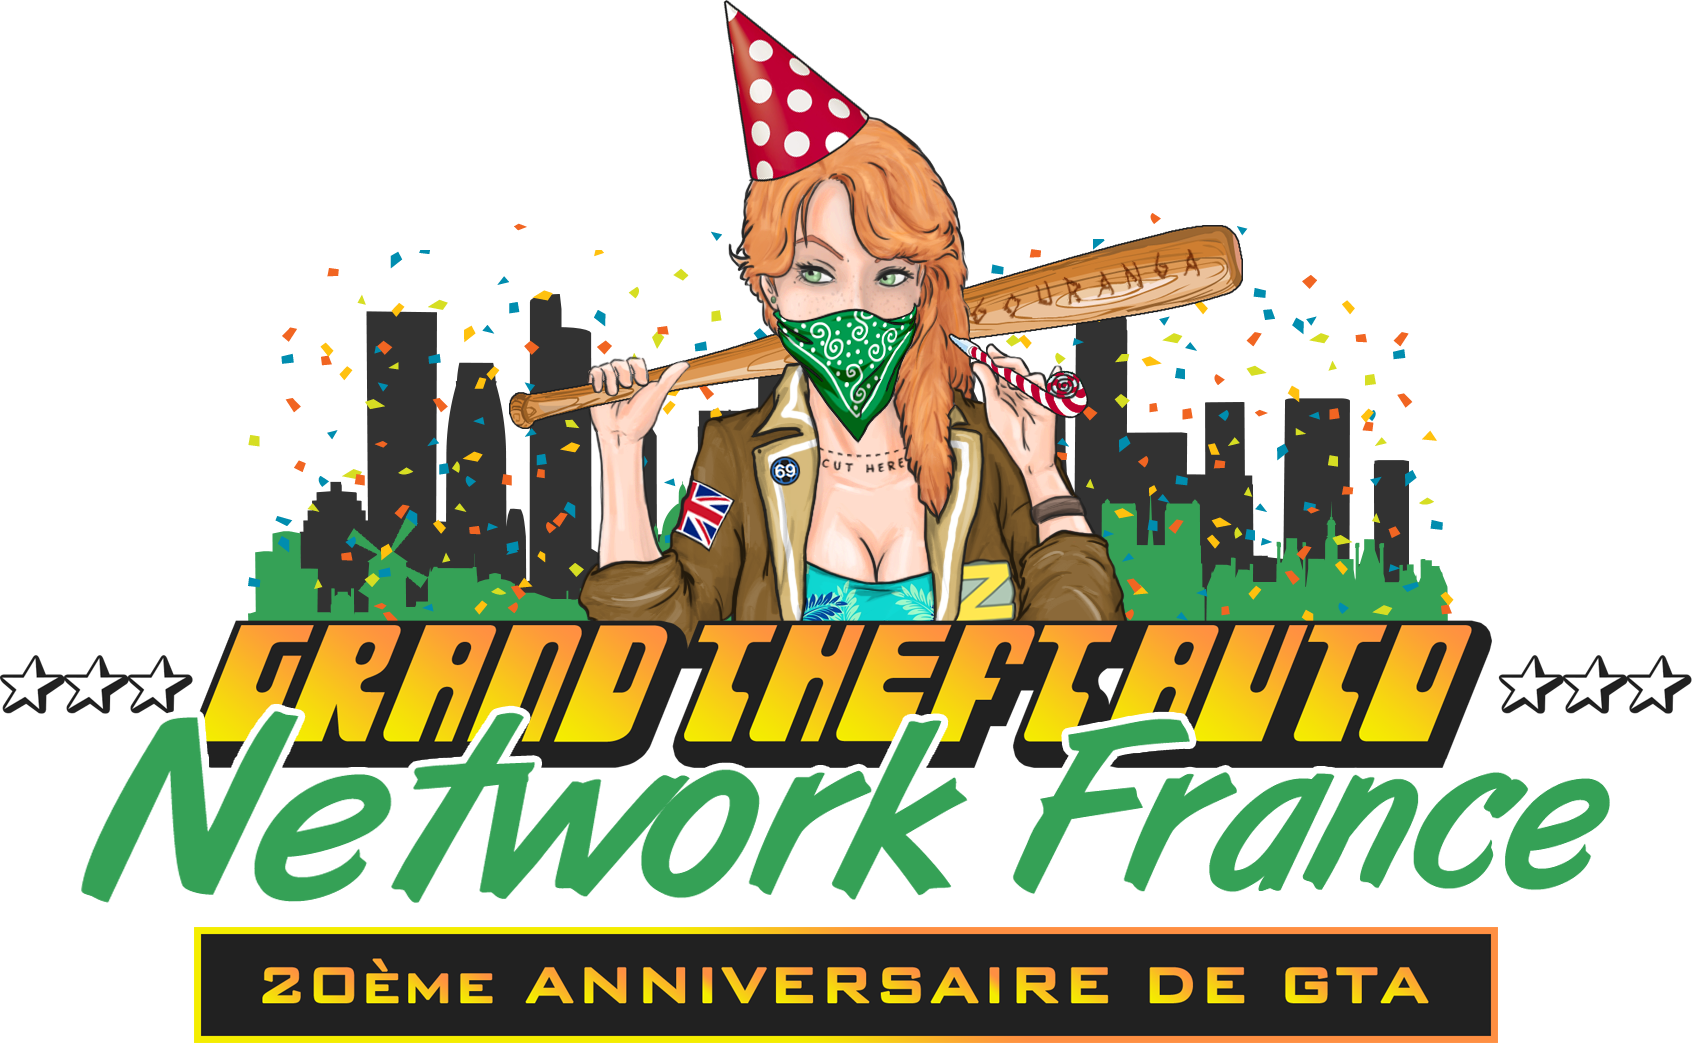 GTA Network France, les forums